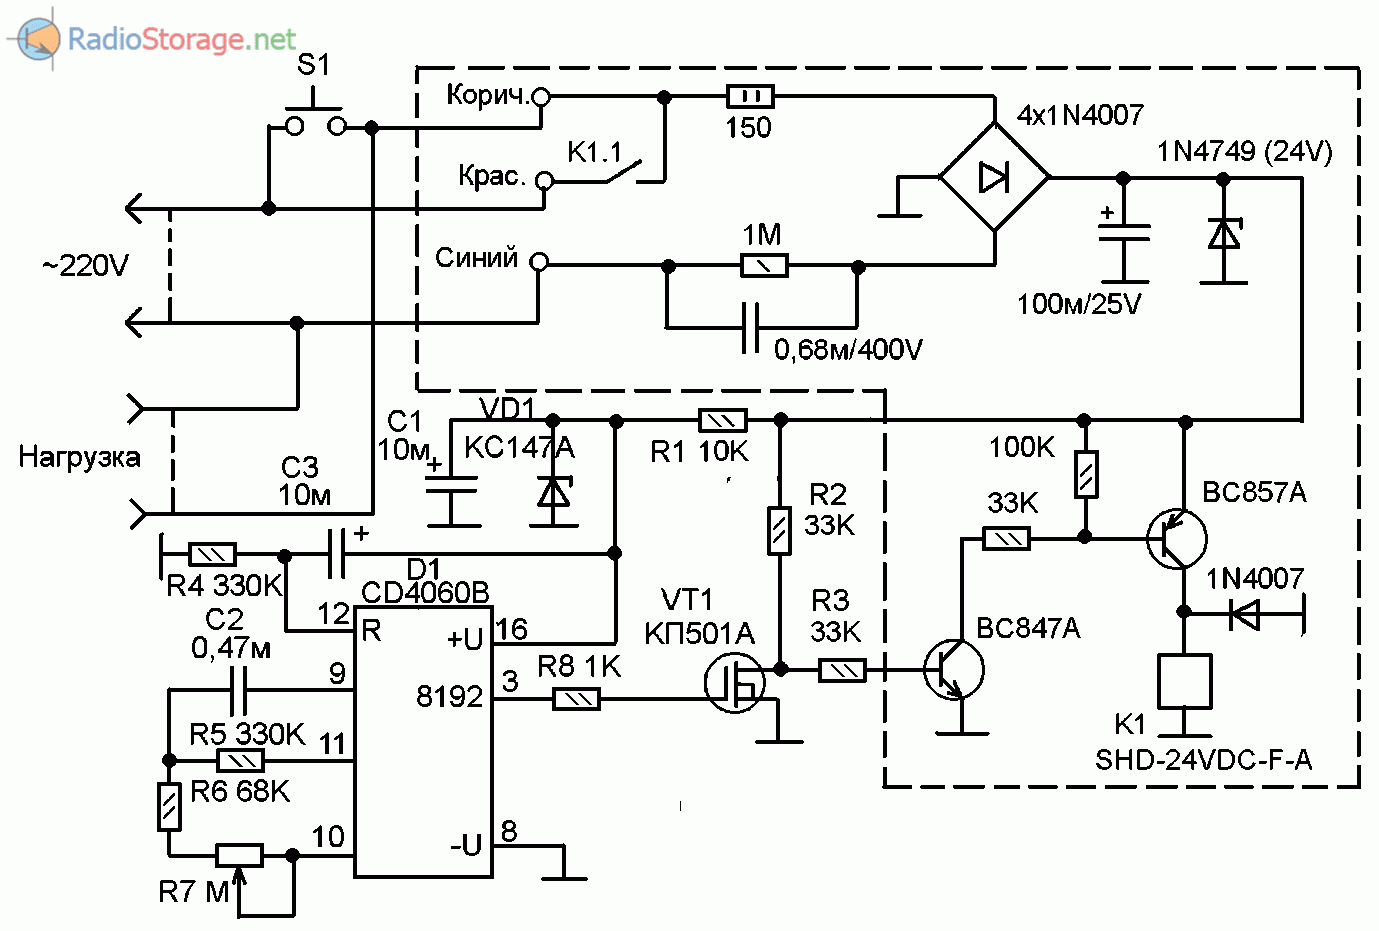 Фотореле фр-601 схема